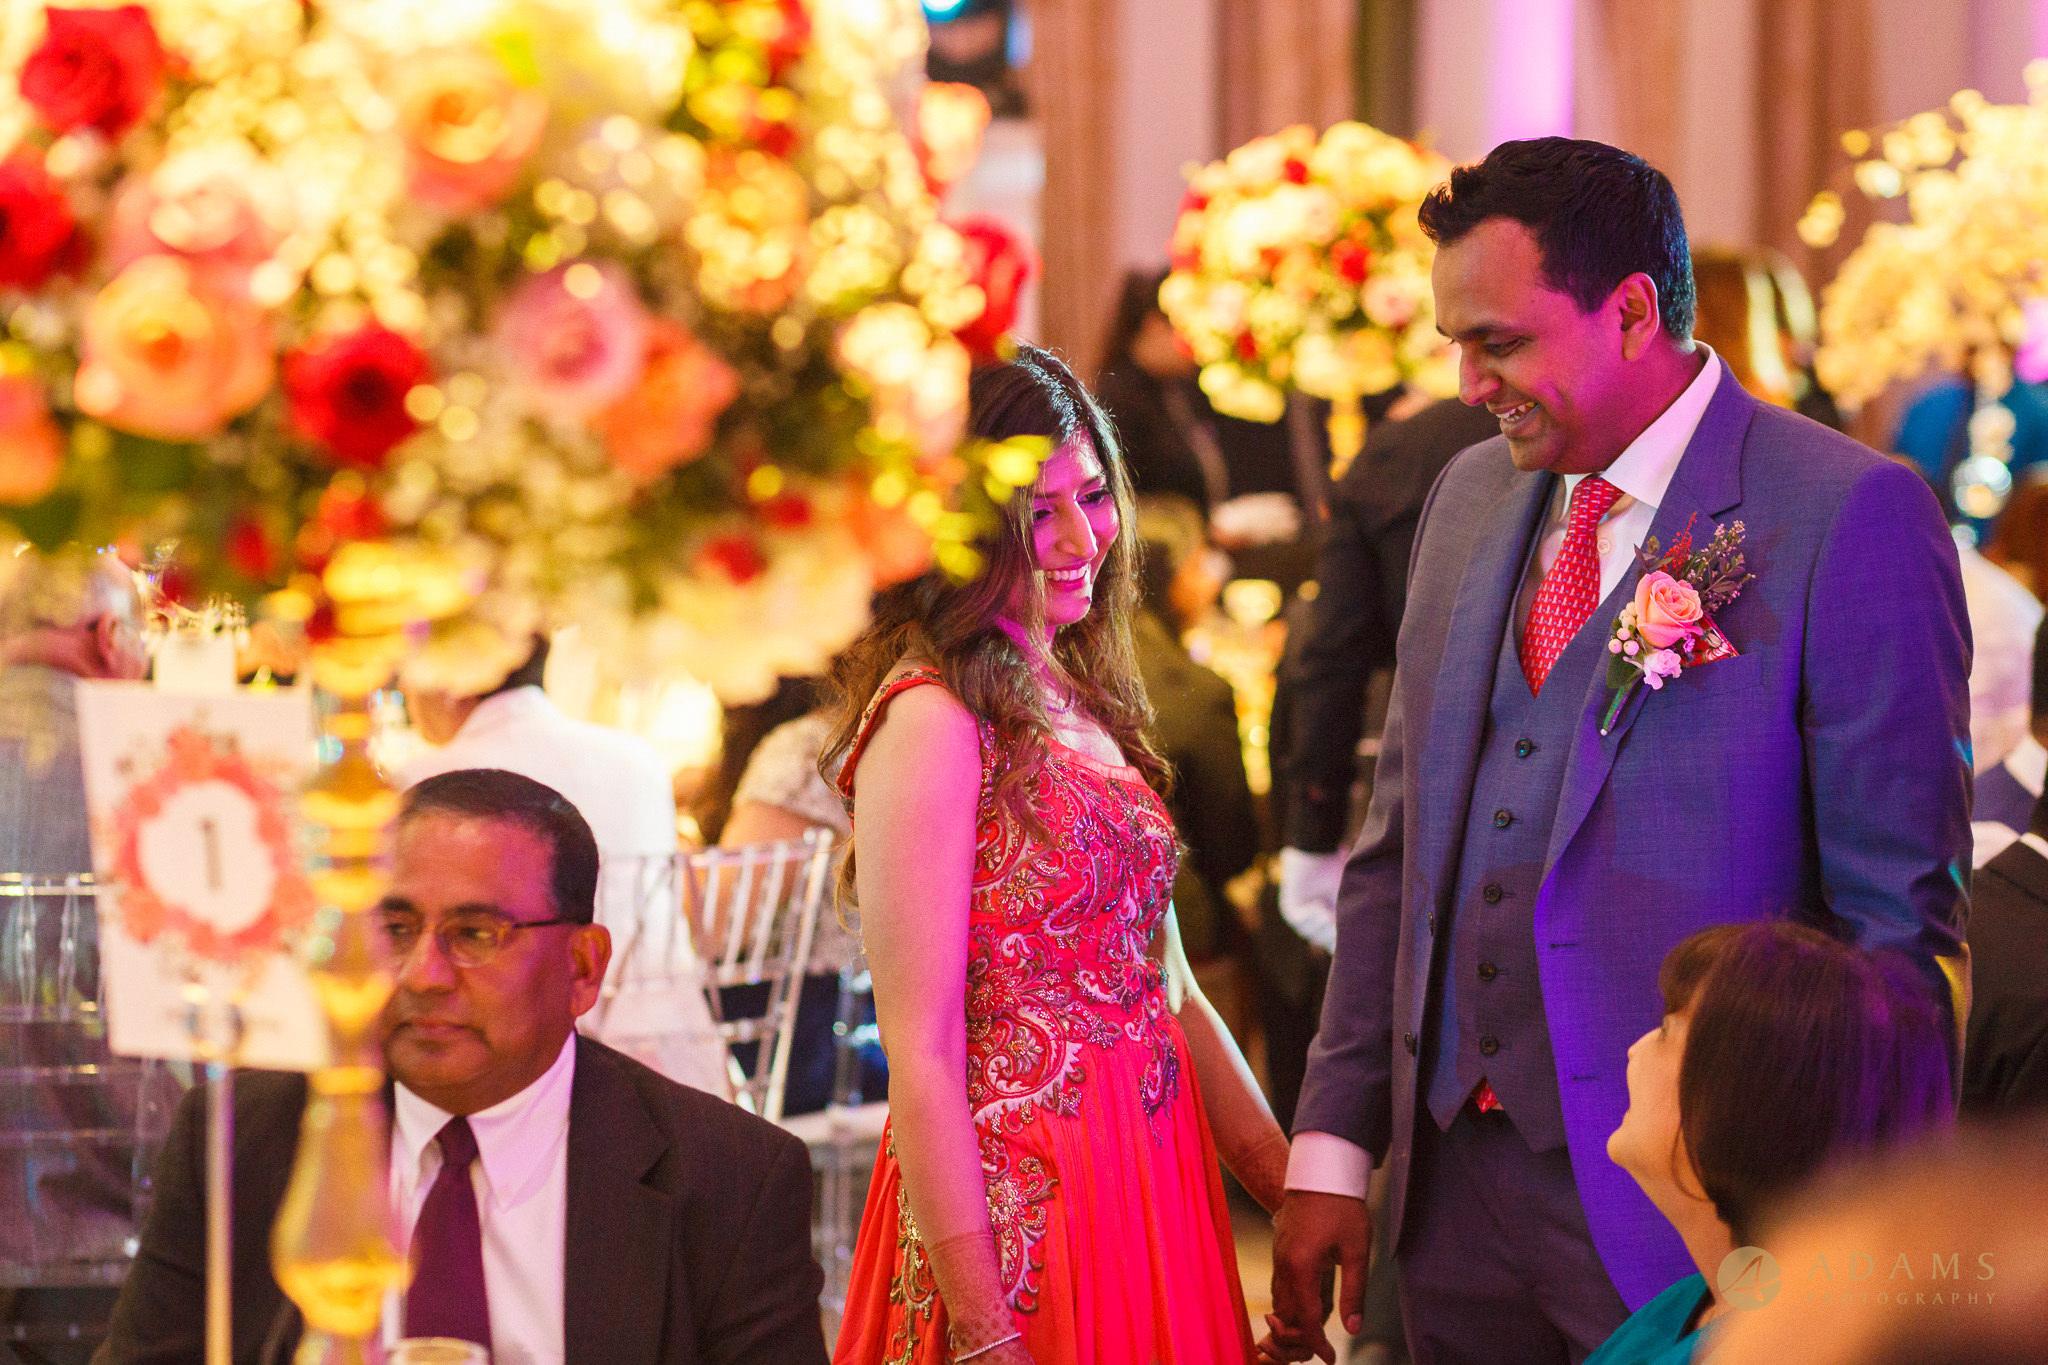 Bride and groom walking between the tables